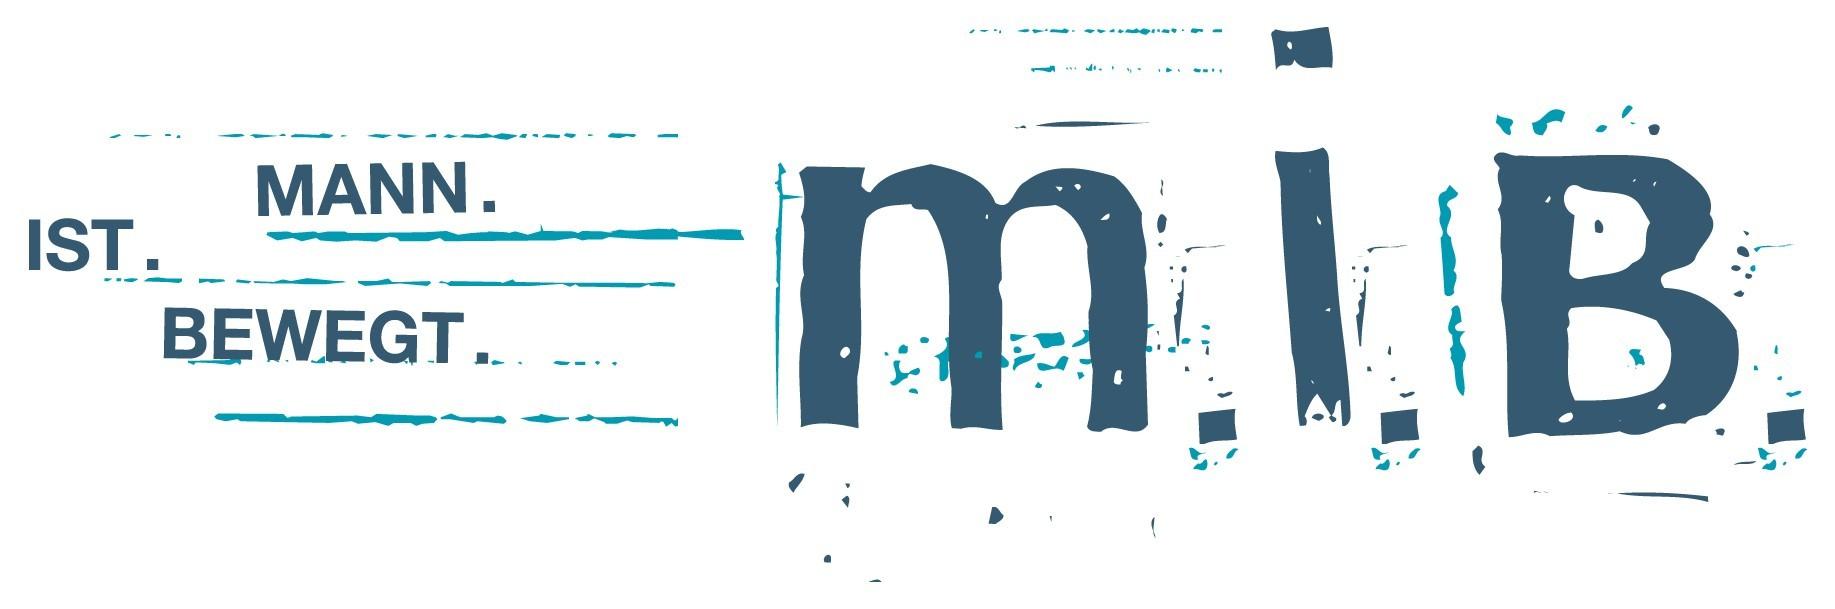 MIB_logo_druck_4c_RZ.jpg